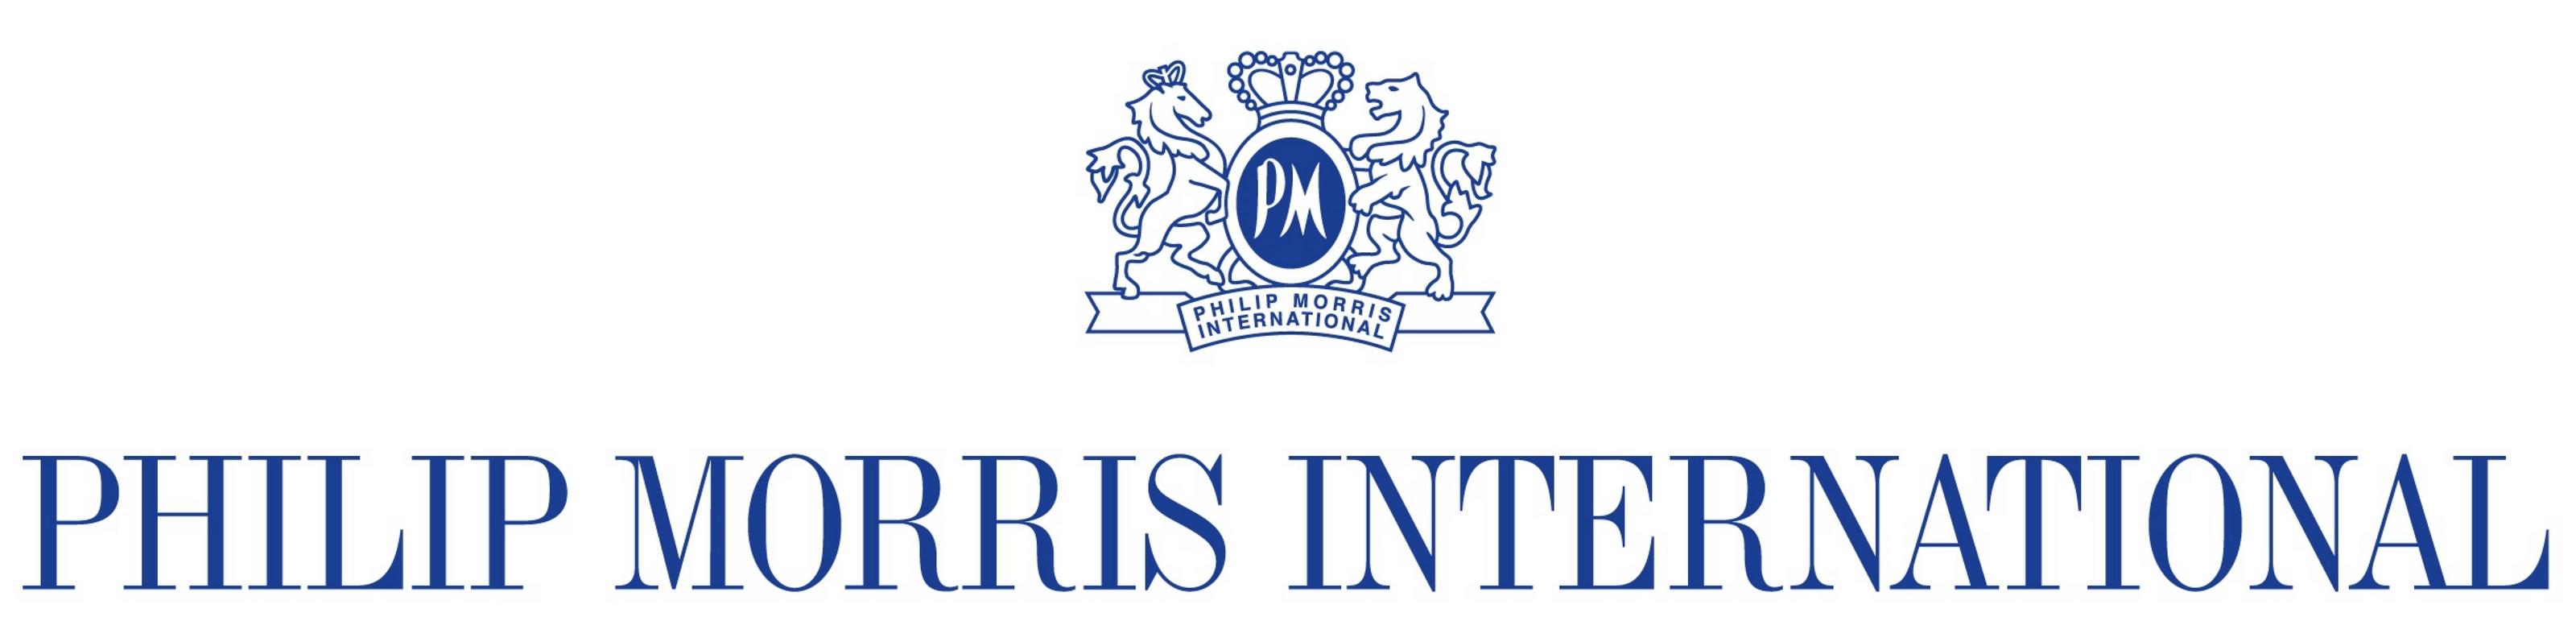 Philip morris international dividend date